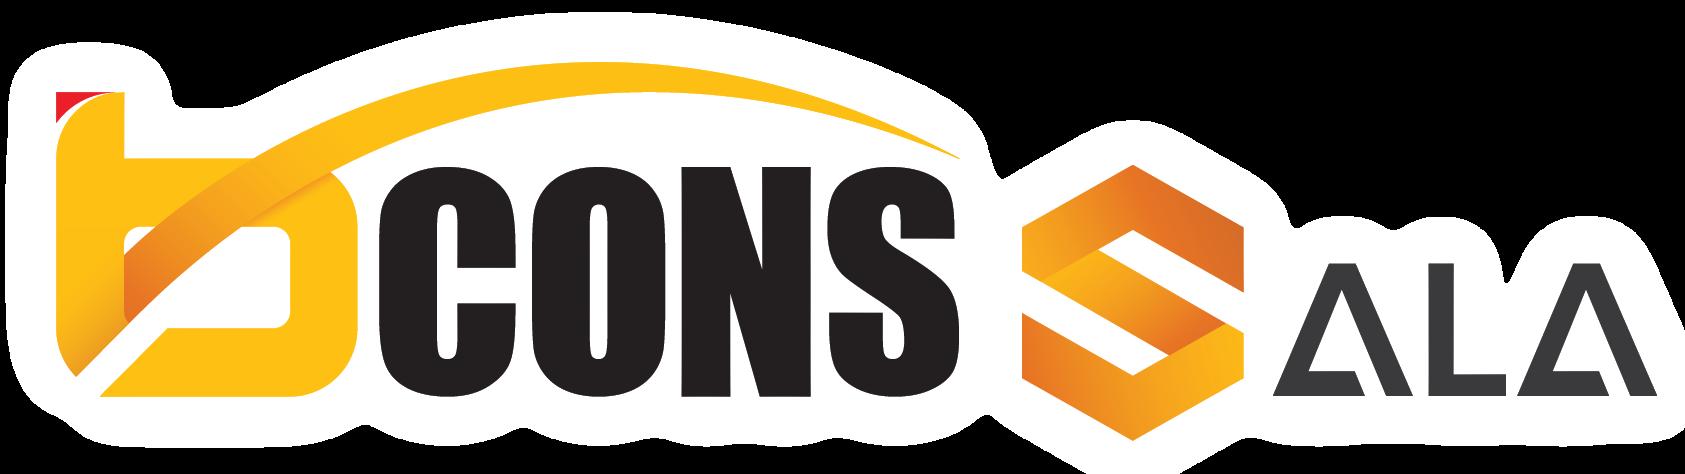 Bcons Sala logo